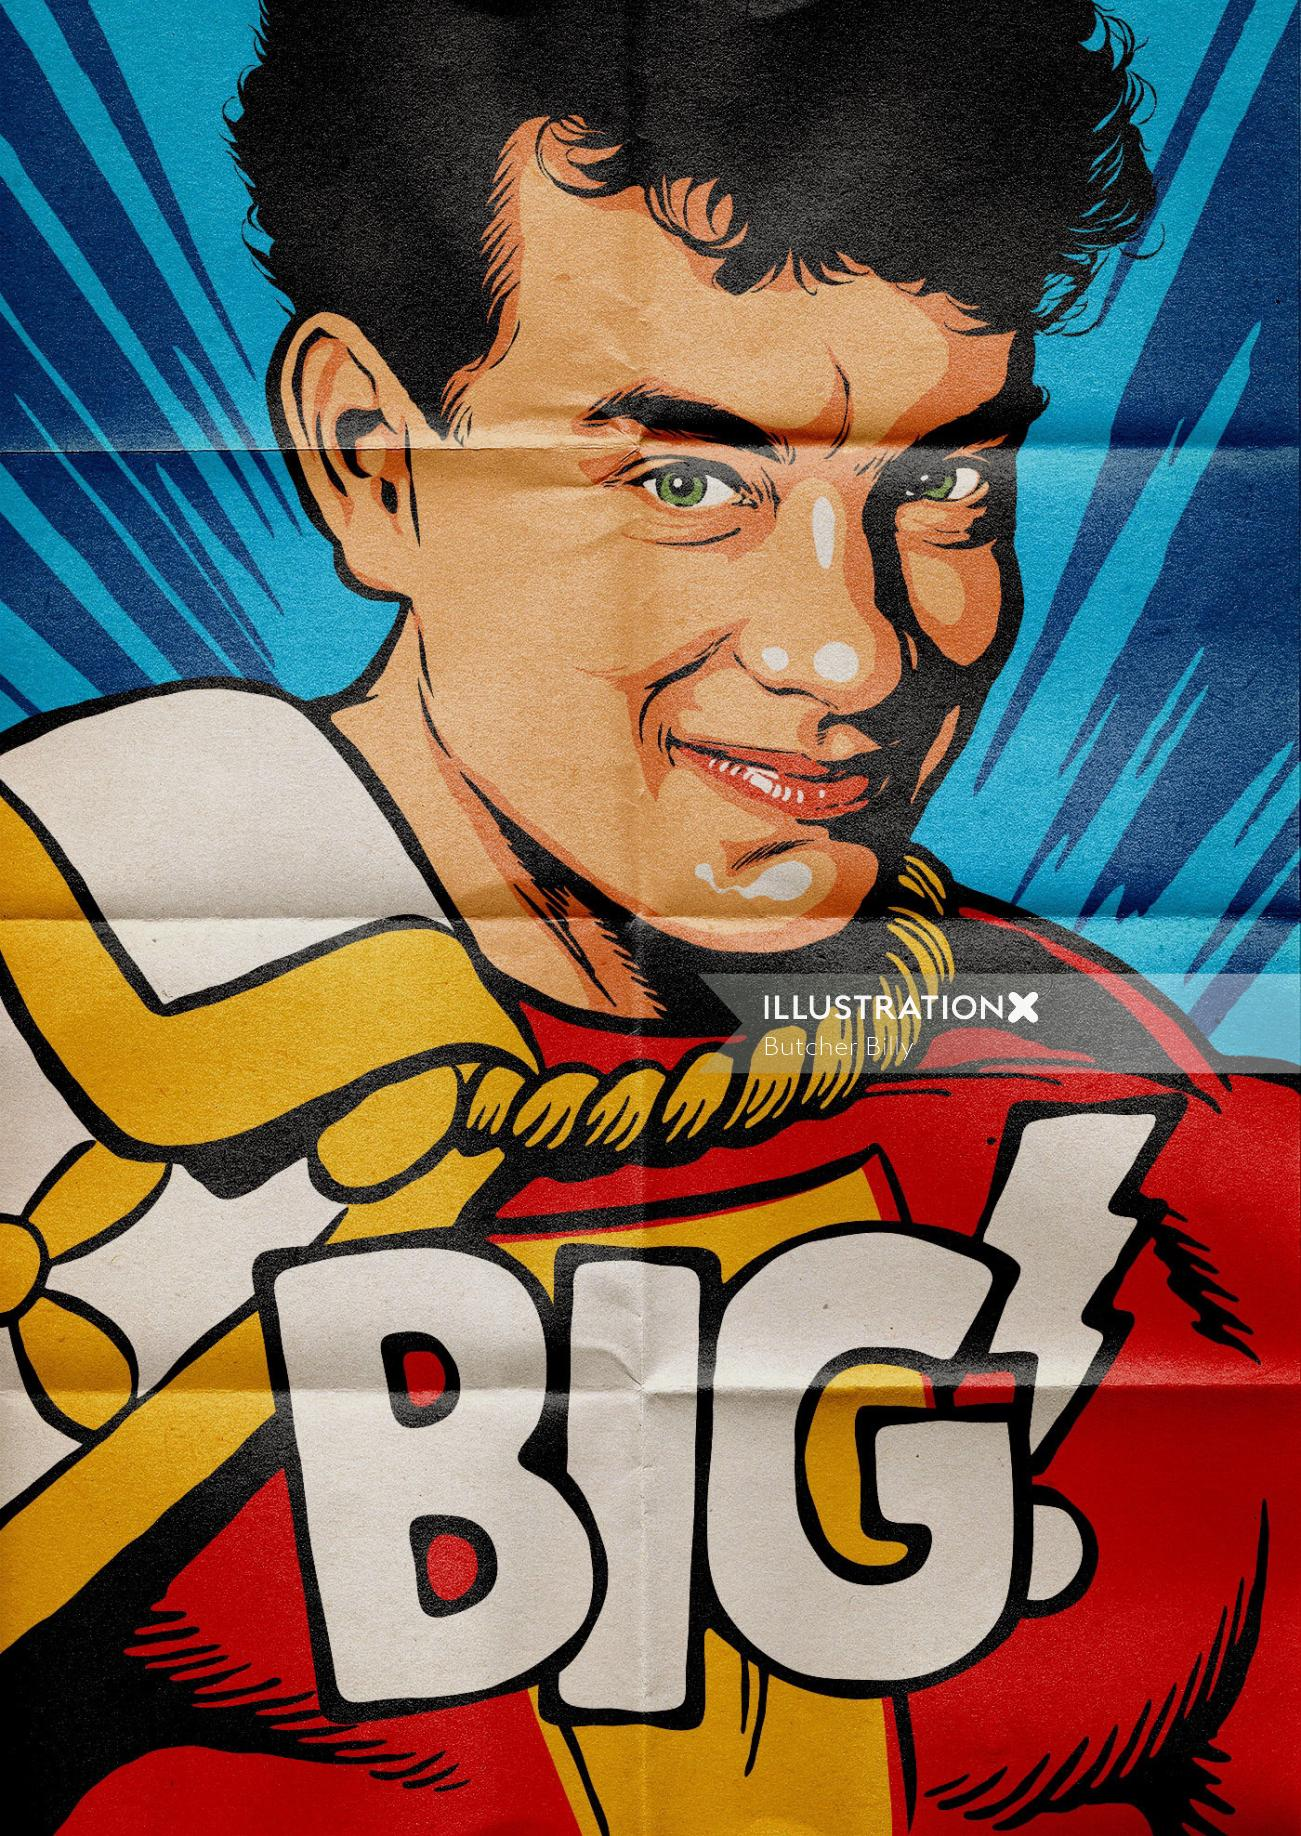 Personal illustration of Tom Hanks in the film Big wearing the Shazam uniform